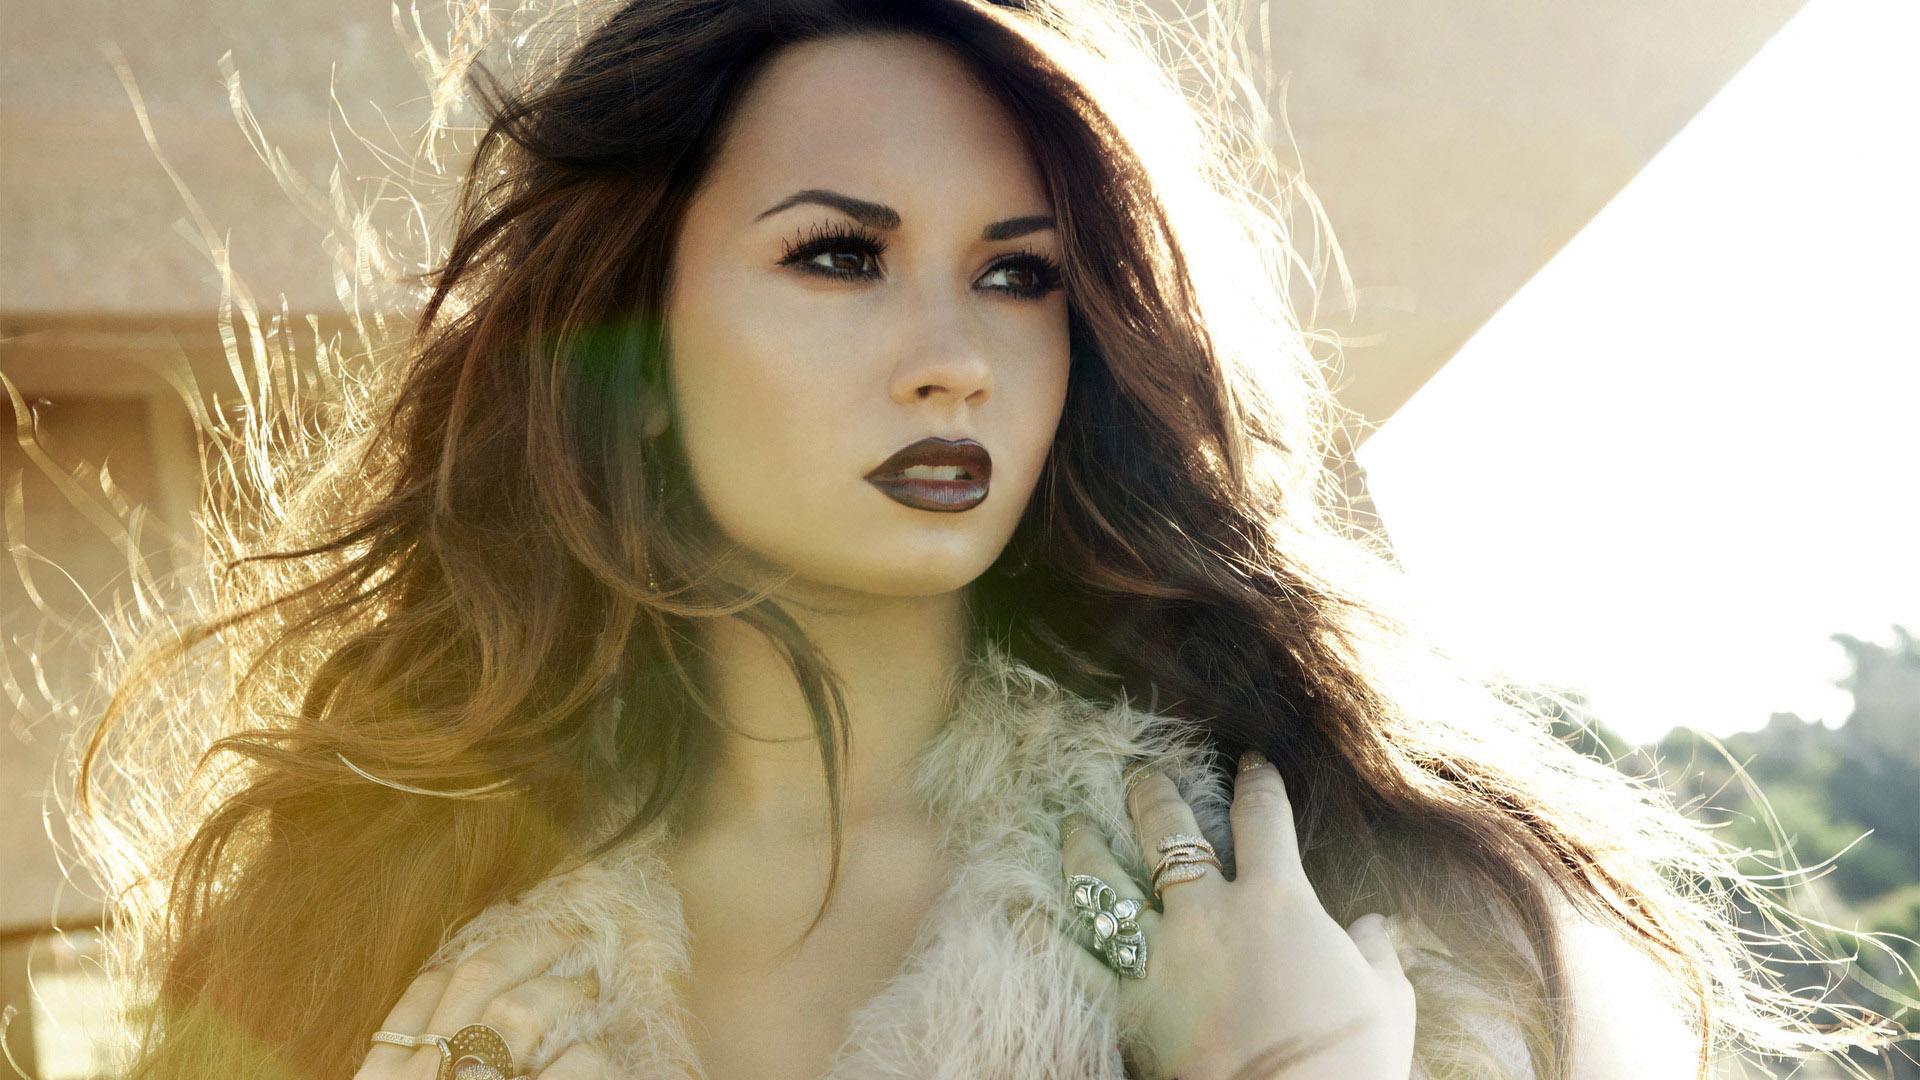 Demi Lovato Unbroken album   1920x1080   Full HD 169 1920x1080